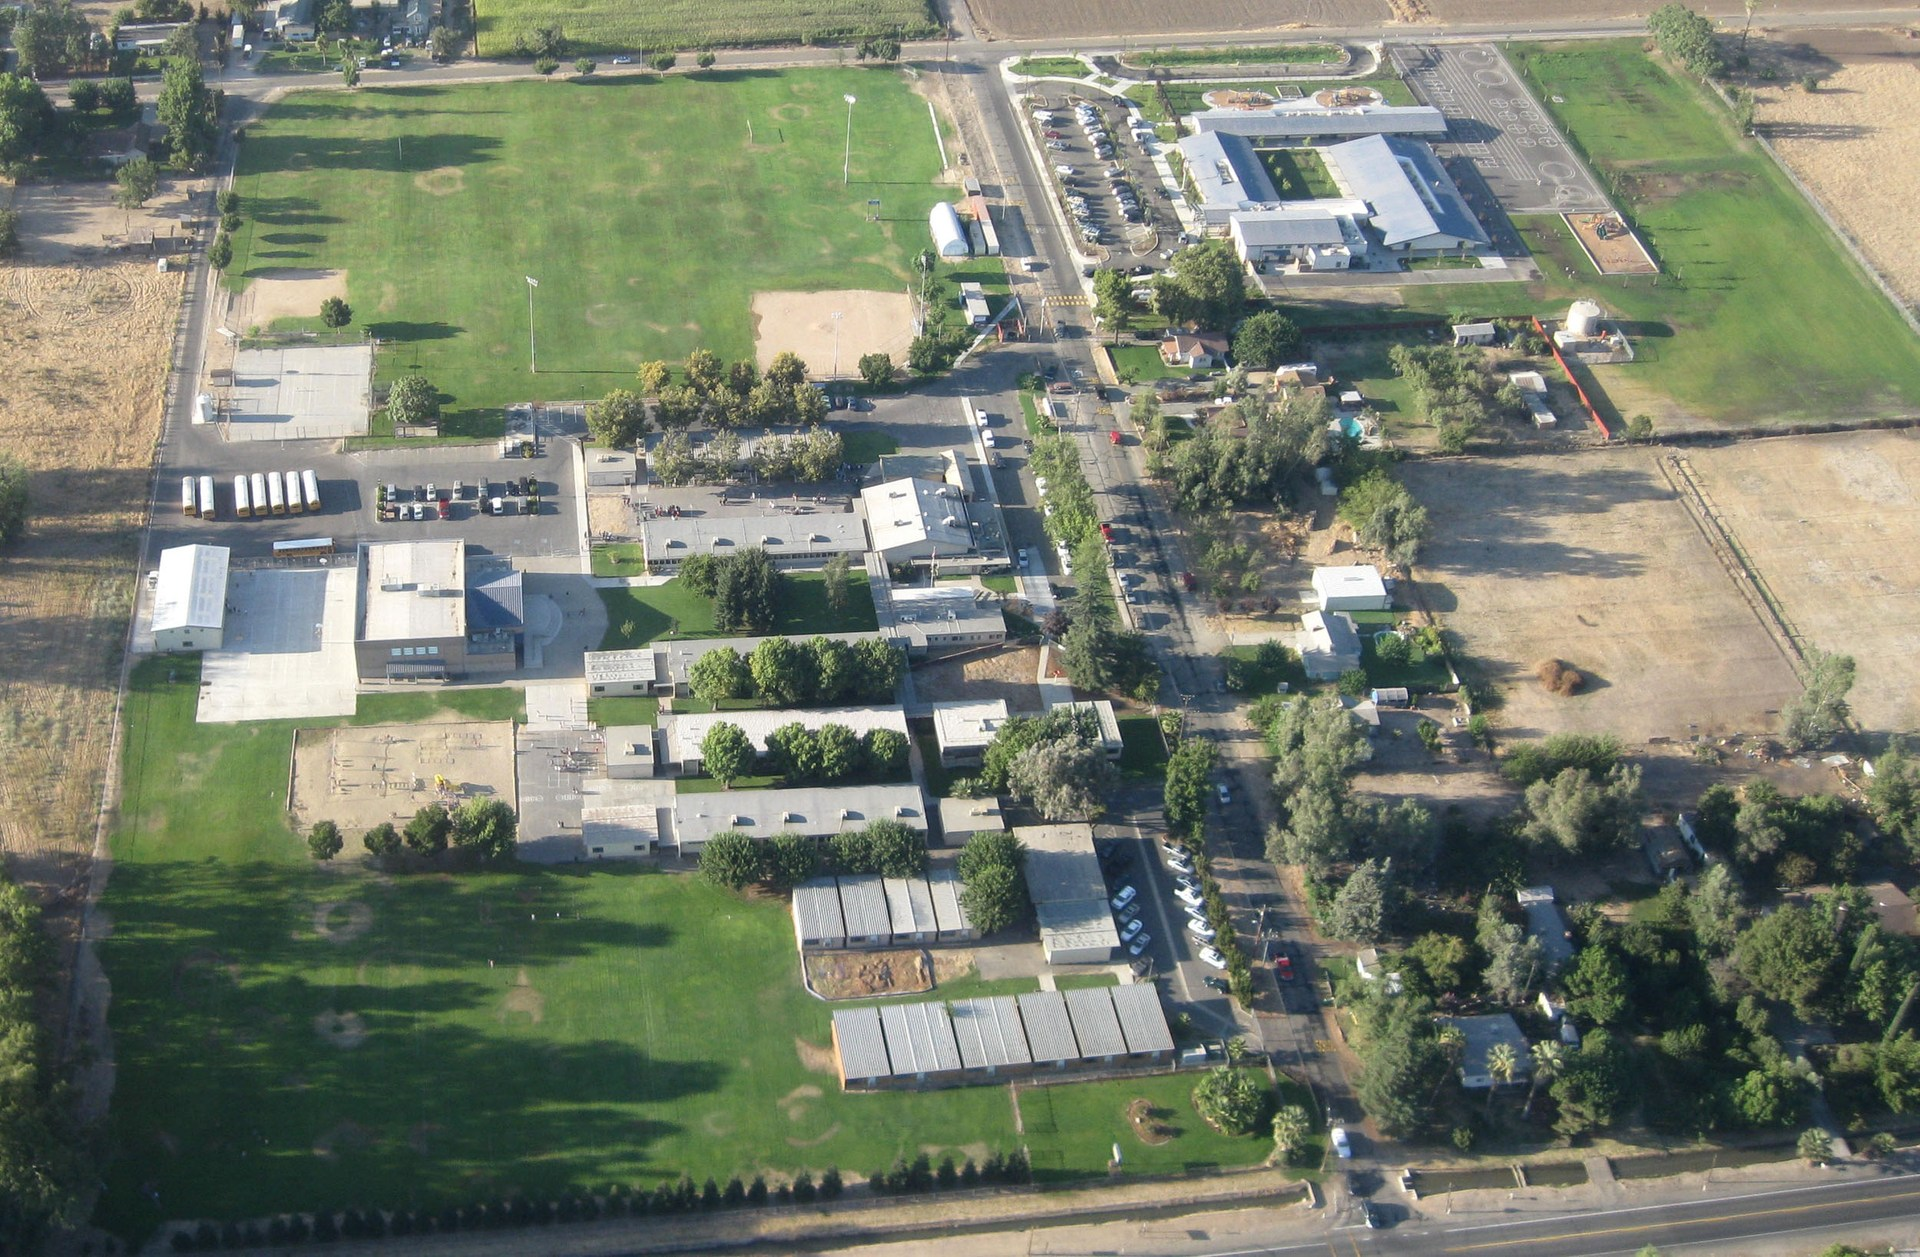 Aerial view of school